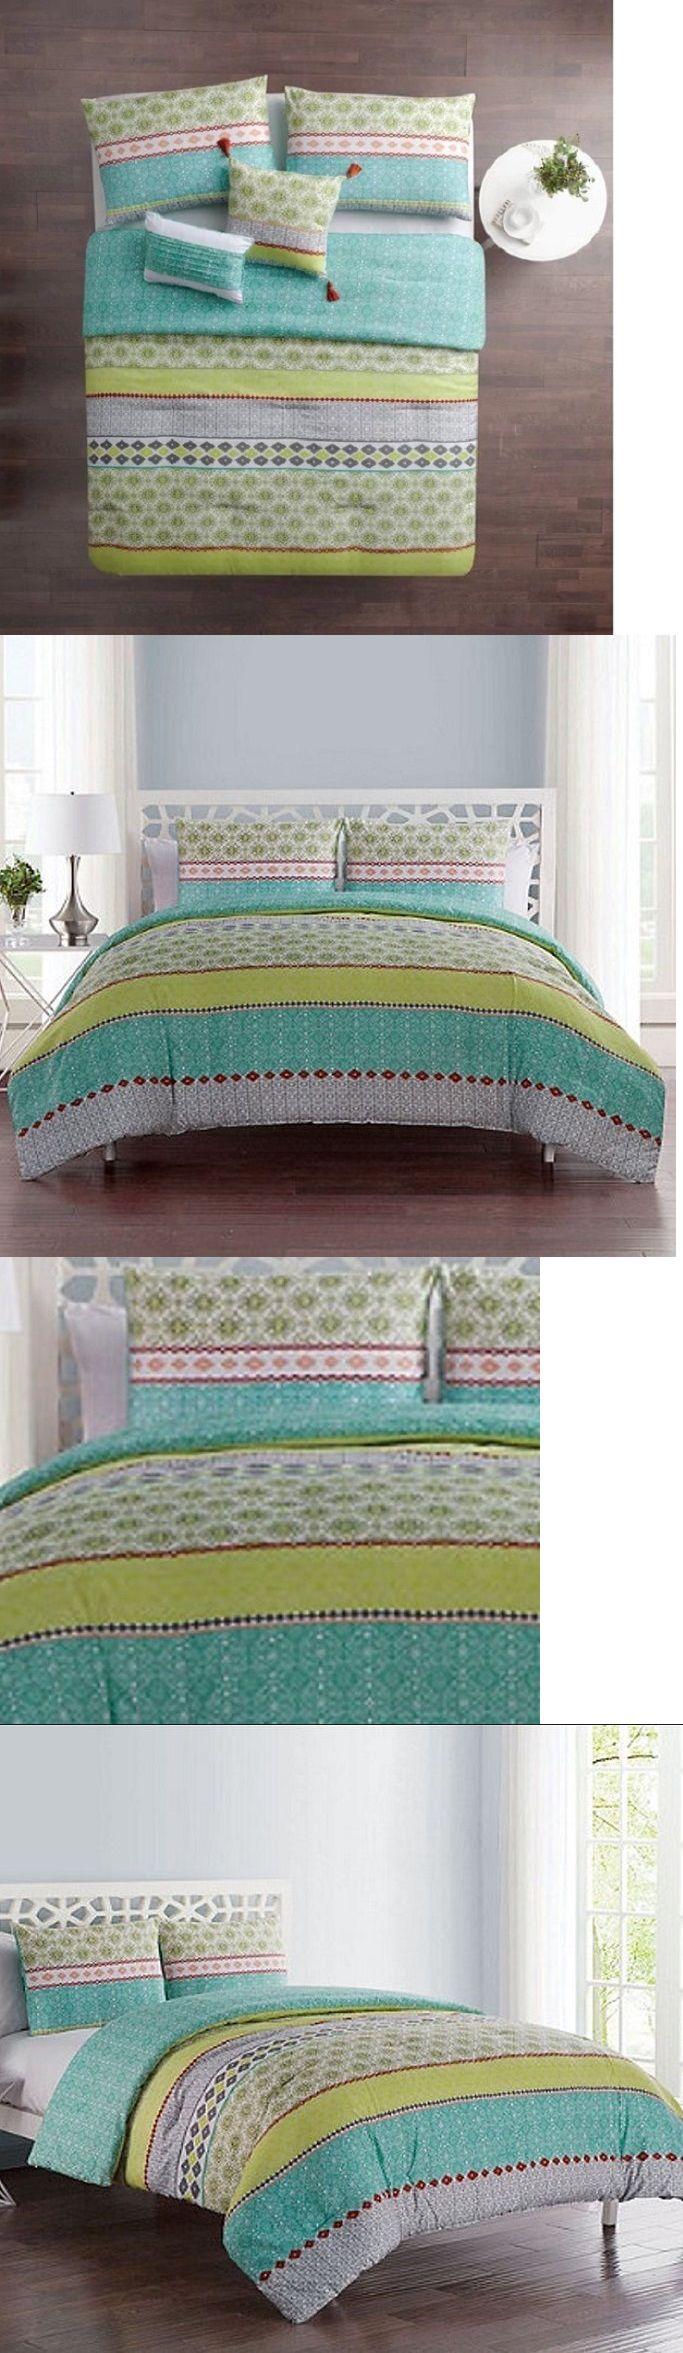 Blue and brown bedding for girls - Bedding Sets 66731 Boho Comforter Set Full Queen Bedding Aqua Lime Green Blue Decor Kid